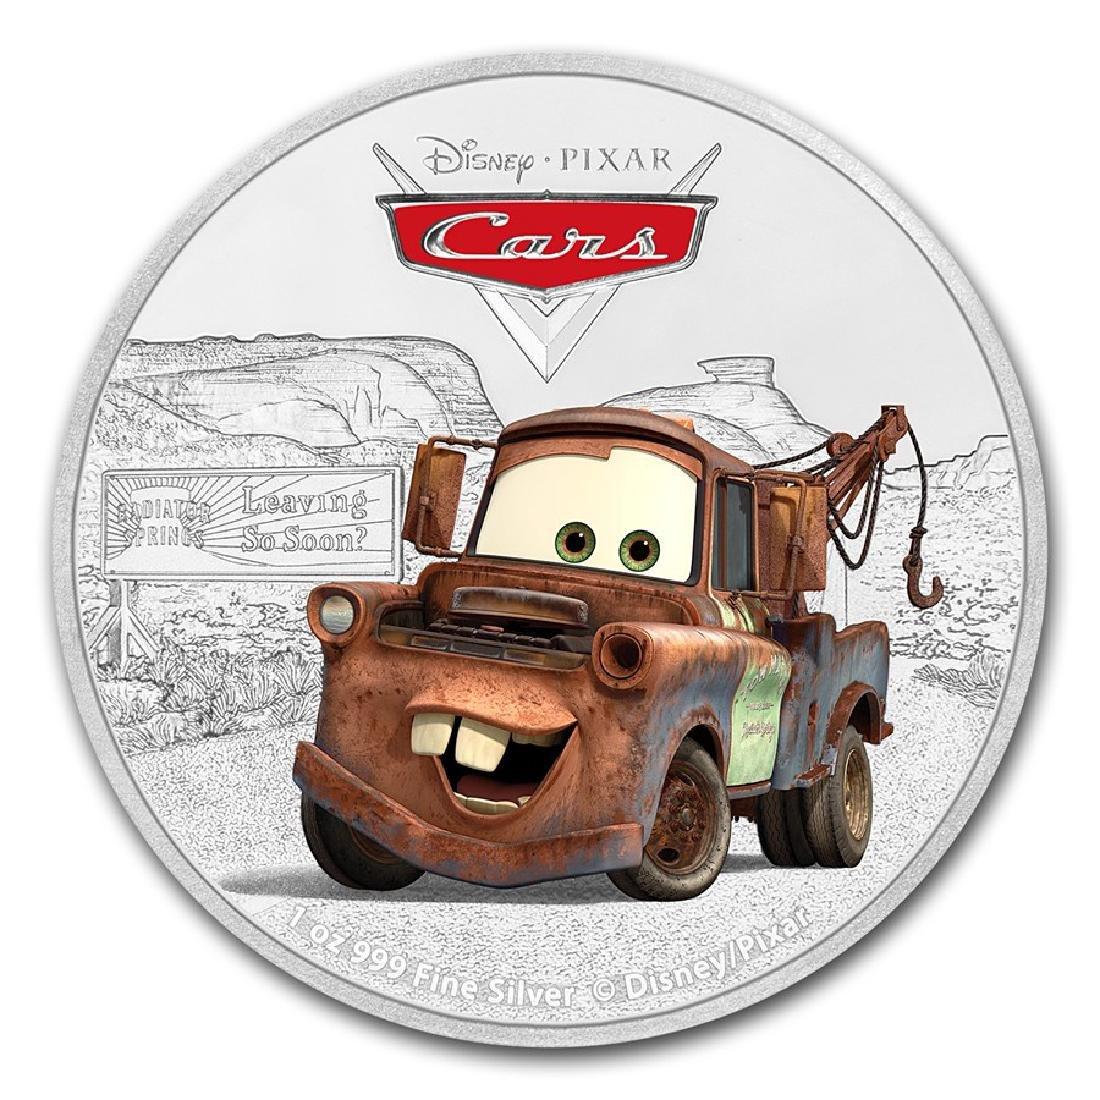 2017 $2 Disney Pixar Cars Tow Mater Niue Silver Coin